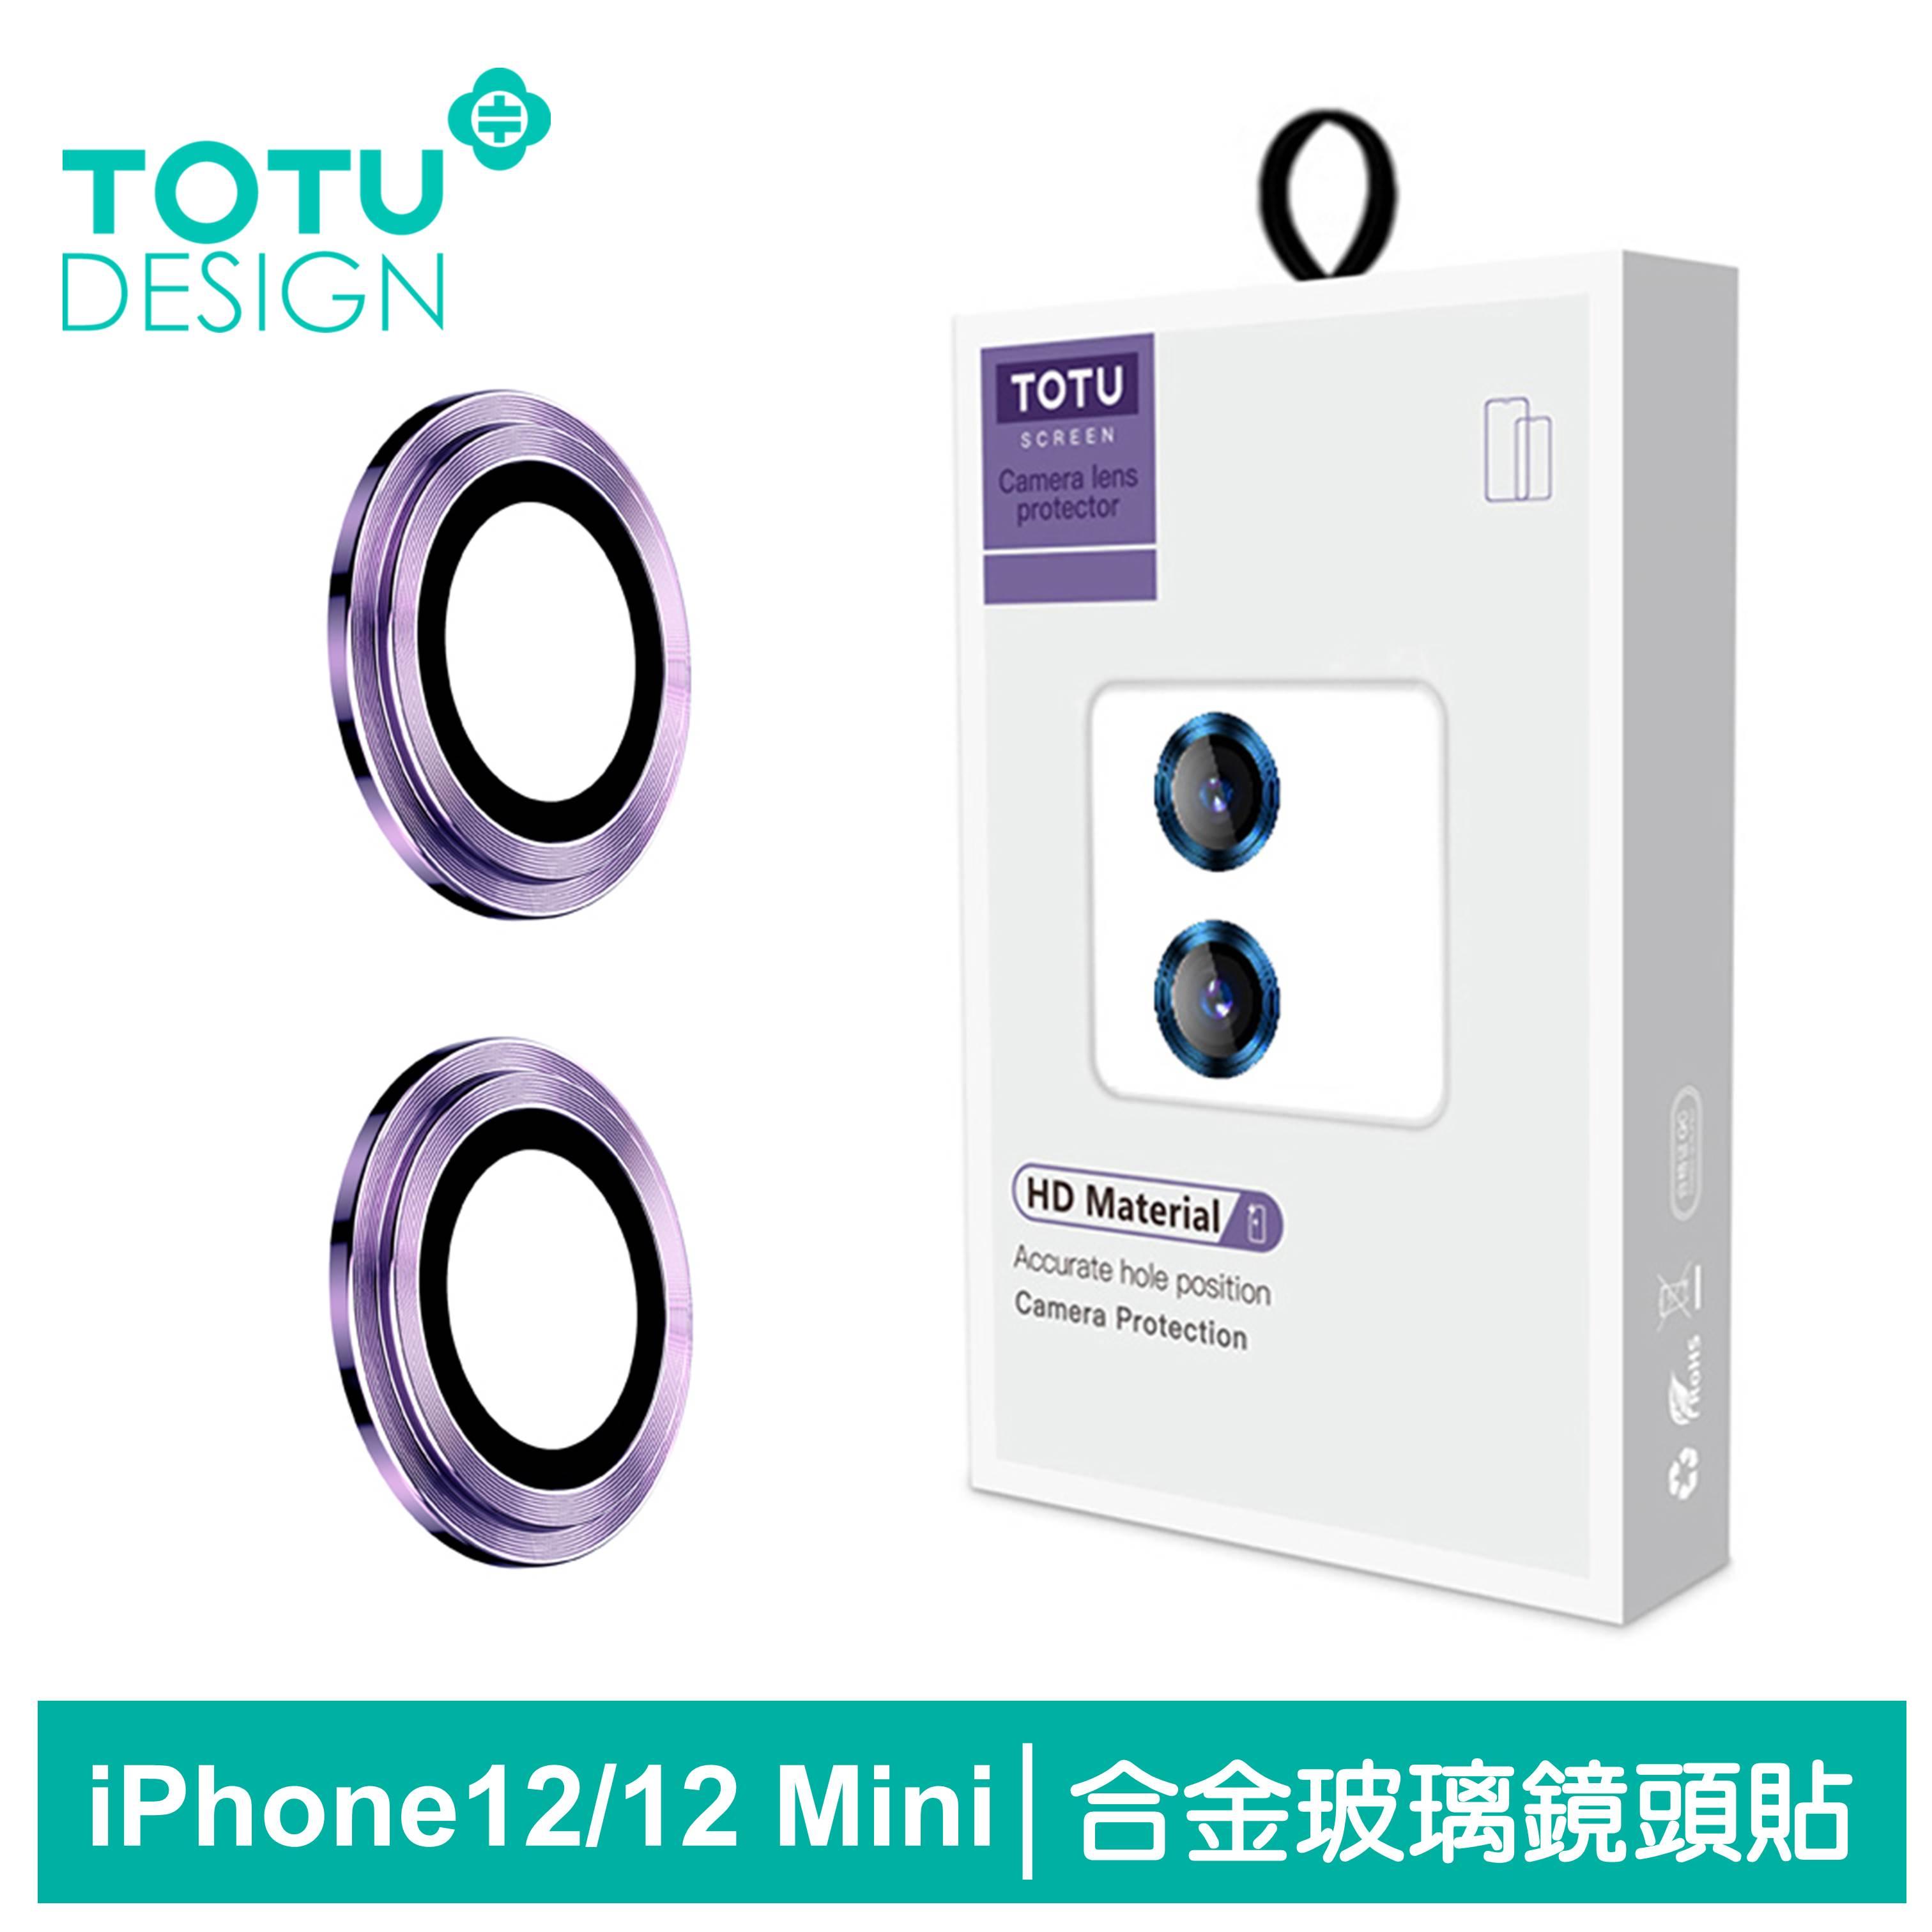 TOTU台灣官方 iPhone 12 /12 Mini 鏡頭貼 i12 Mini 鋼化膜 保護貼 鋁合金鋼化玻璃 金盾系列 紫色